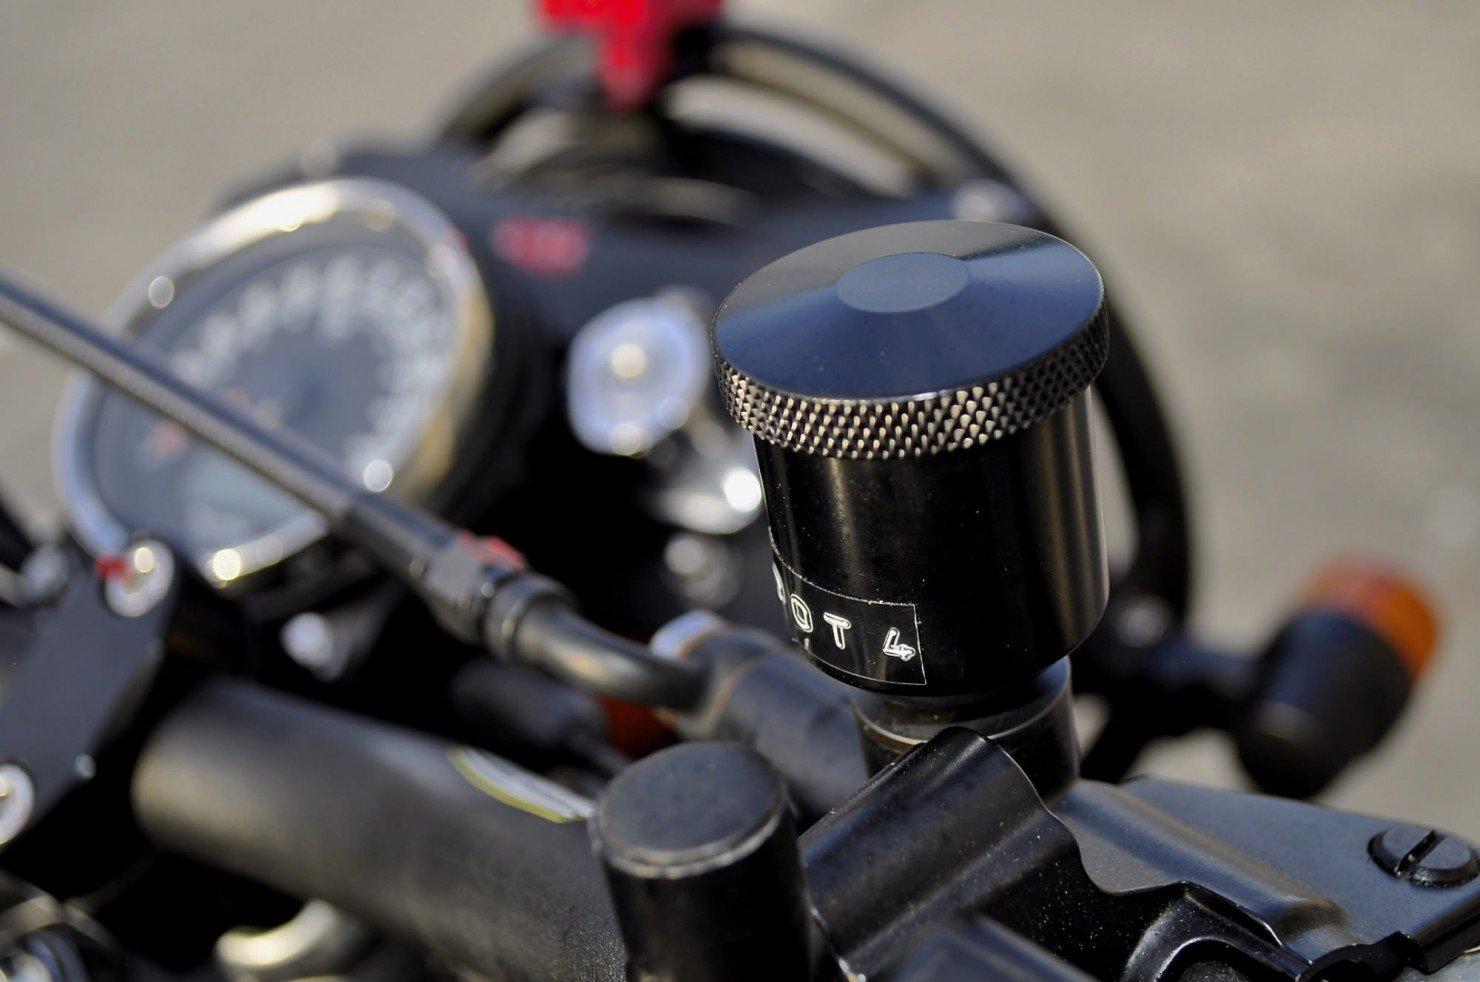 triumph_enduro_motorcycle_13